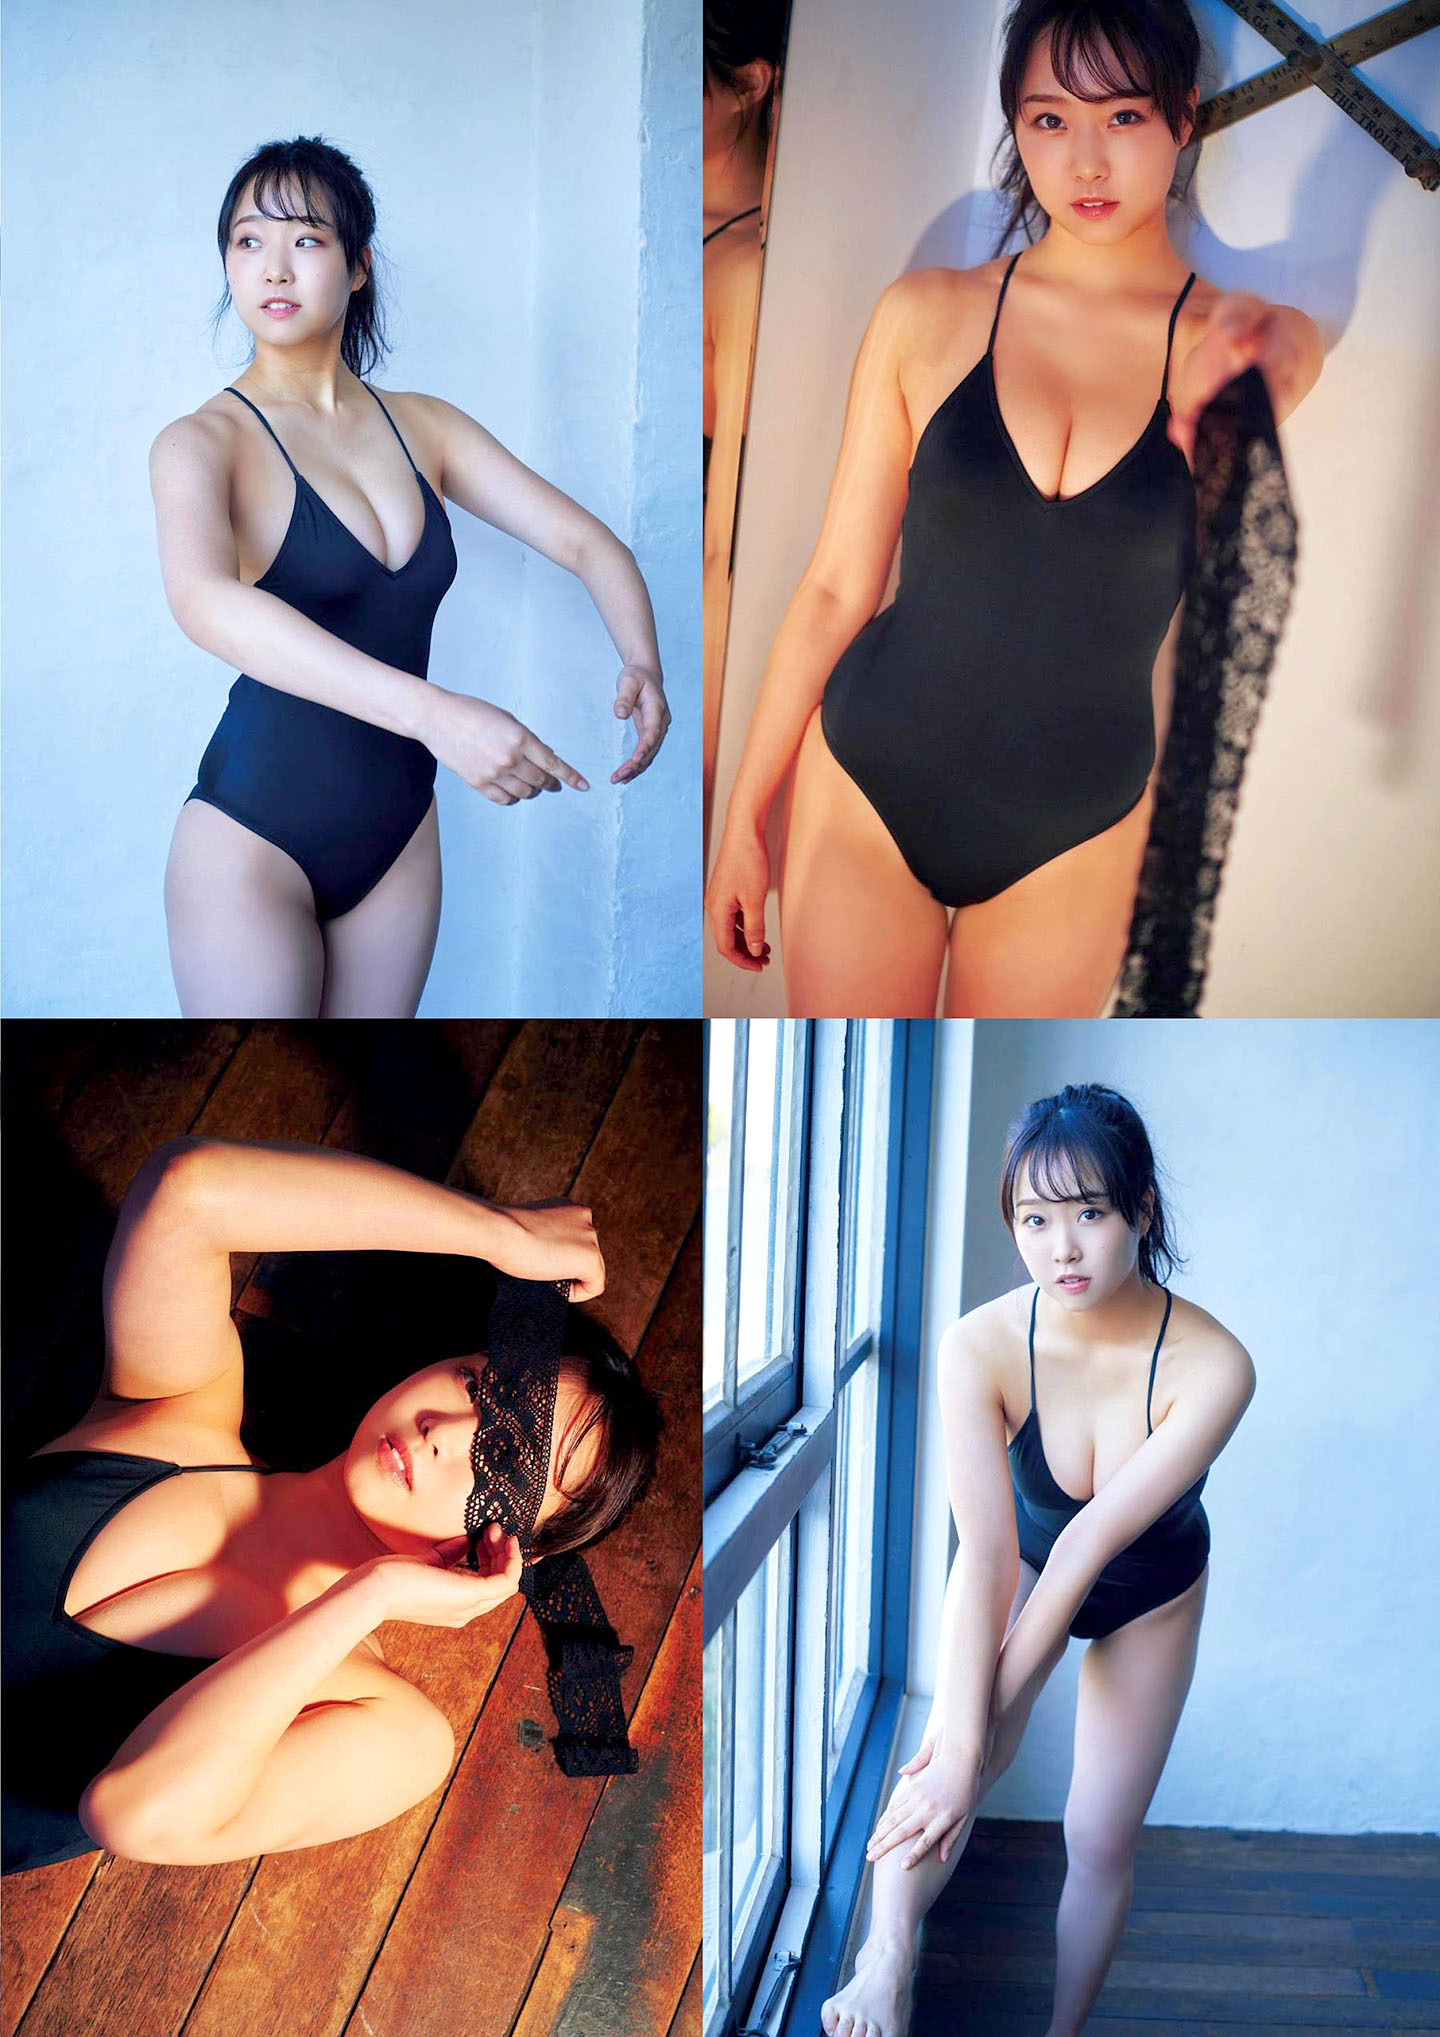 Yuuka Kato NMB48 EnTame 210304 06.jpg